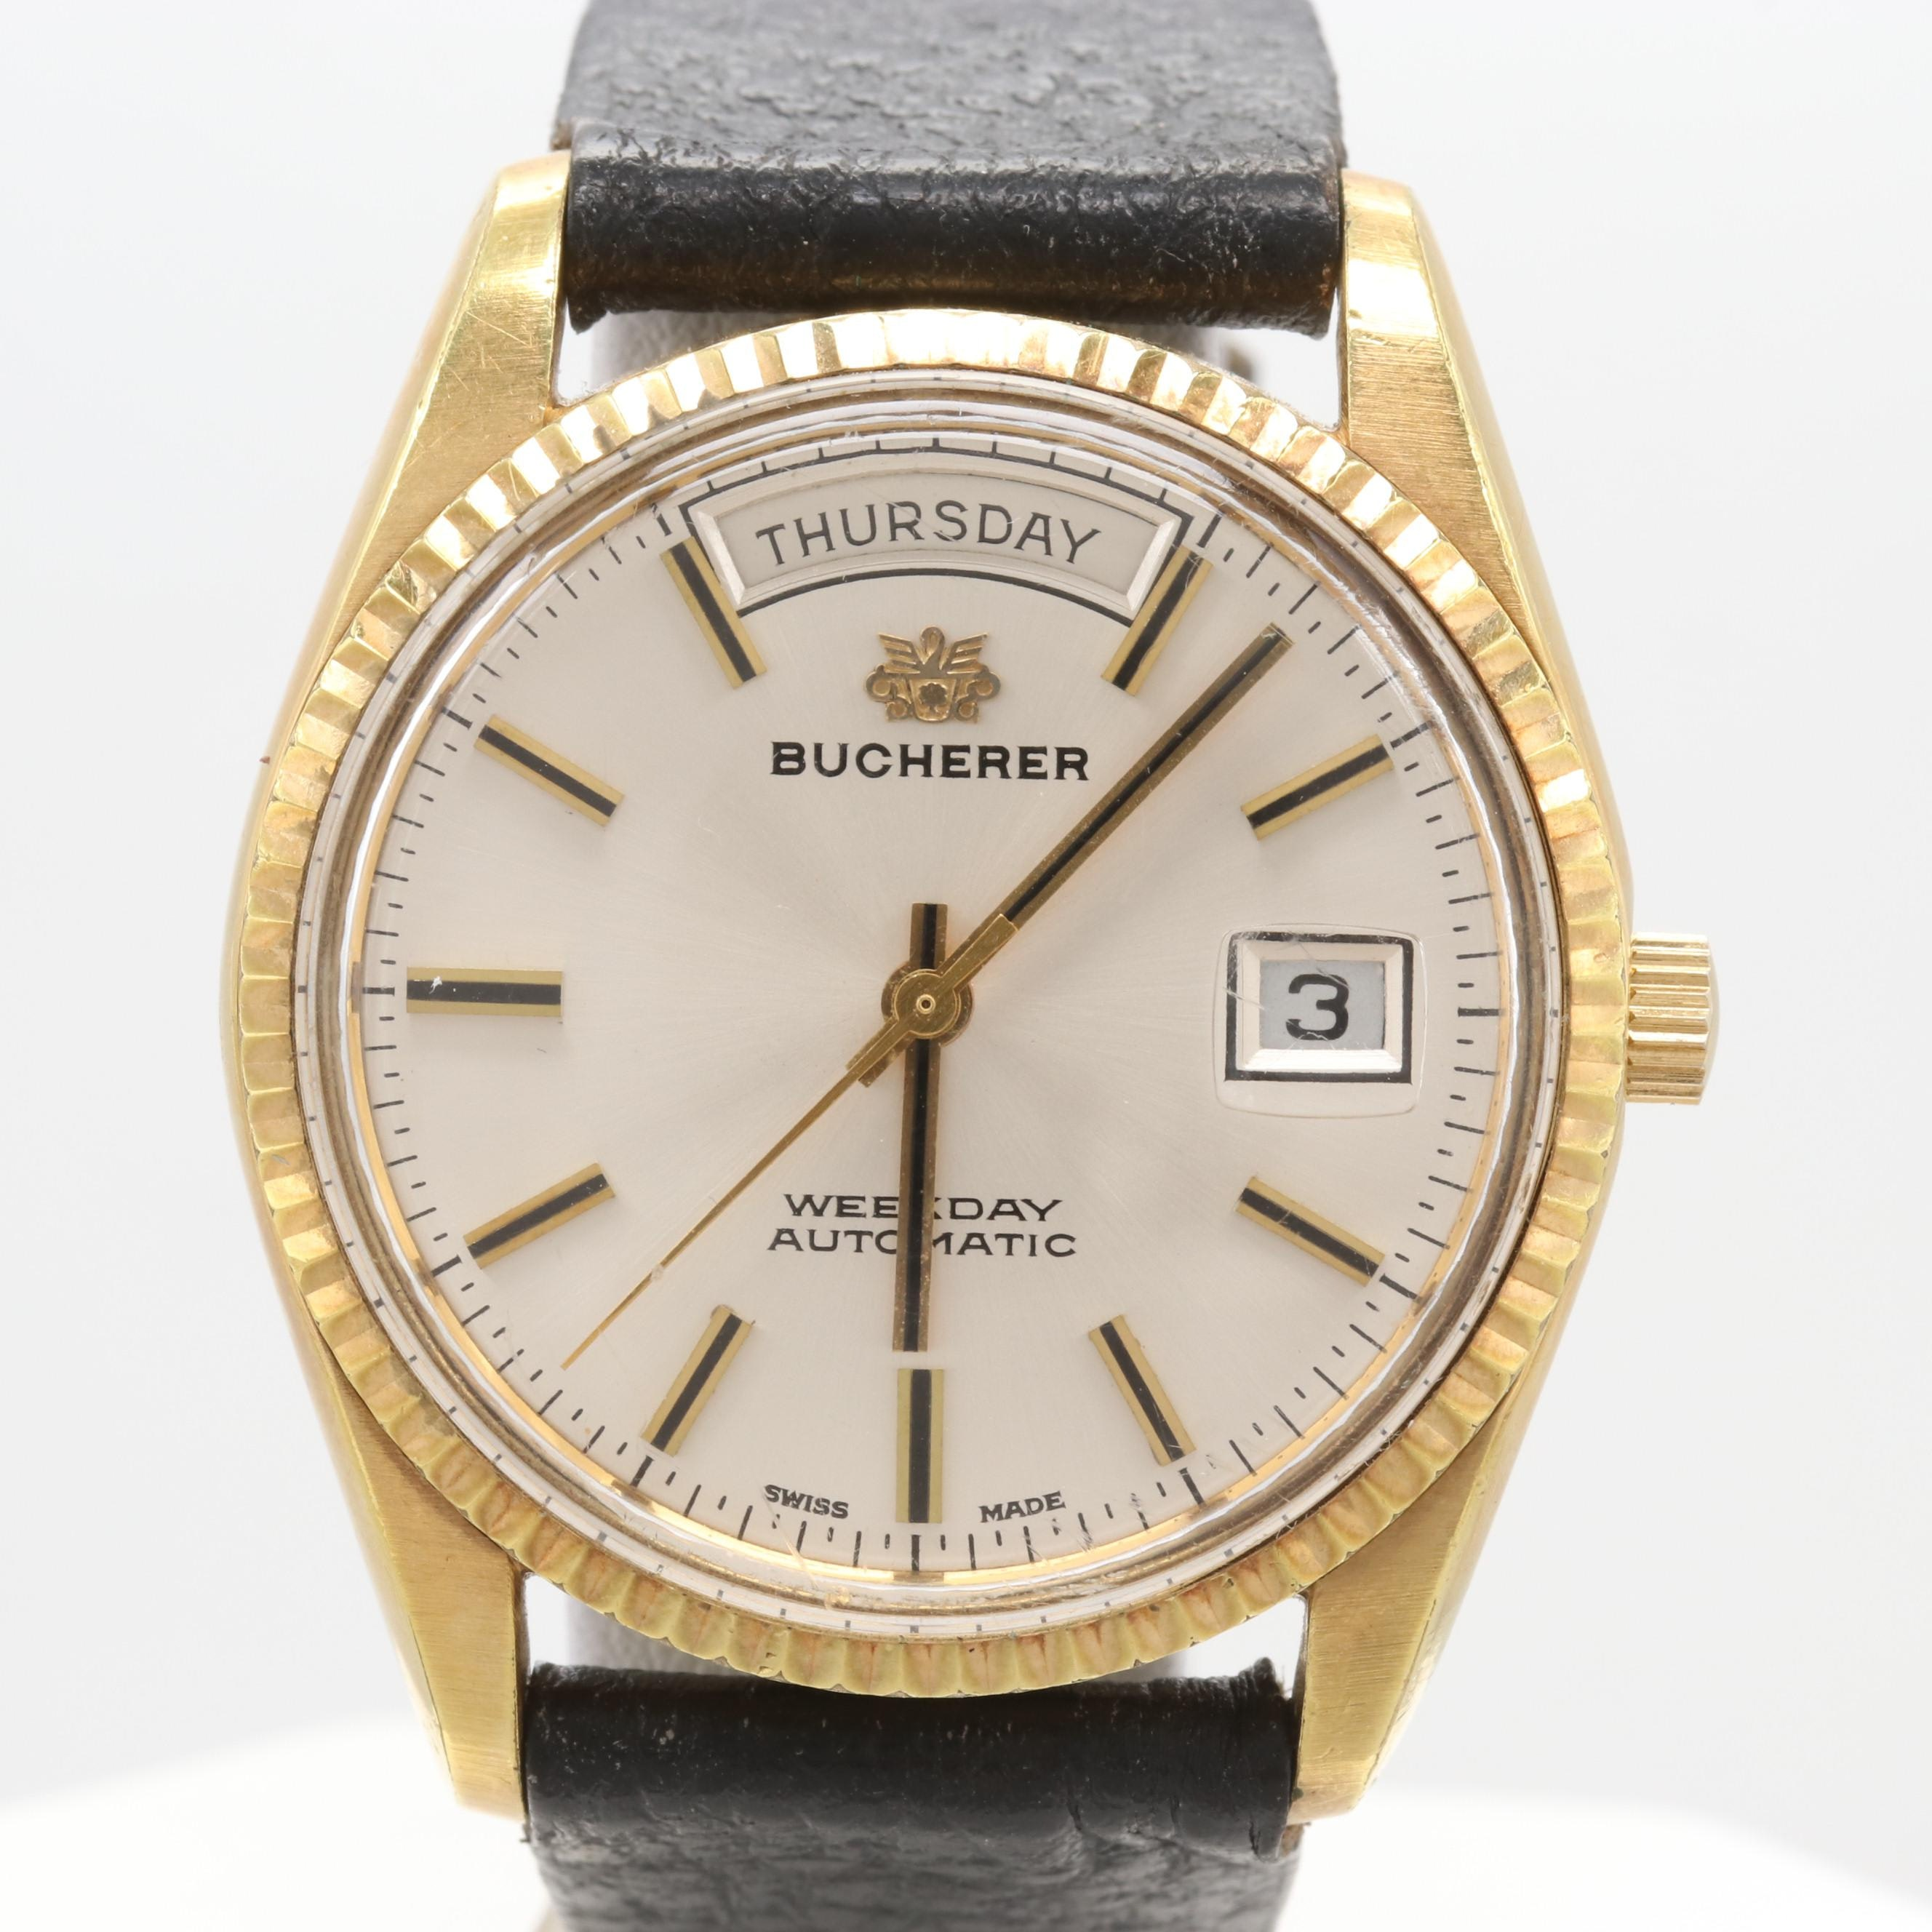 Bucherer Weekday Automatic Wristwatch Circa 1970s